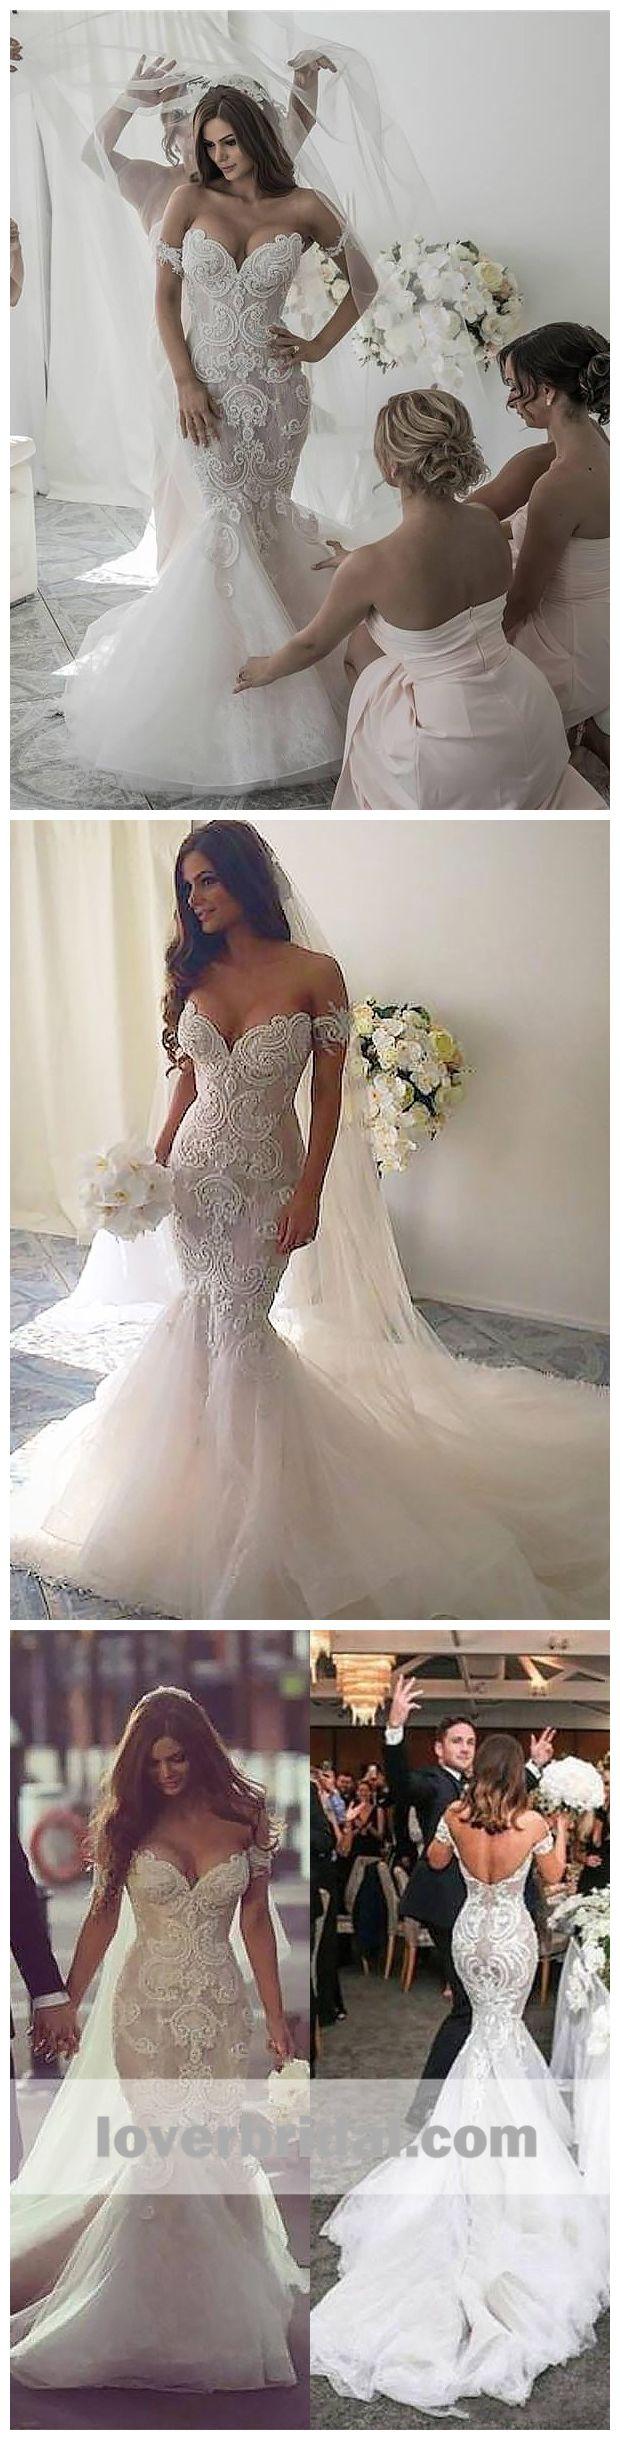 Off the shoulder lace mermaid wedding dress  Sexy Off Shoulder Backless Lace Mermaid Wedding Dresses Online